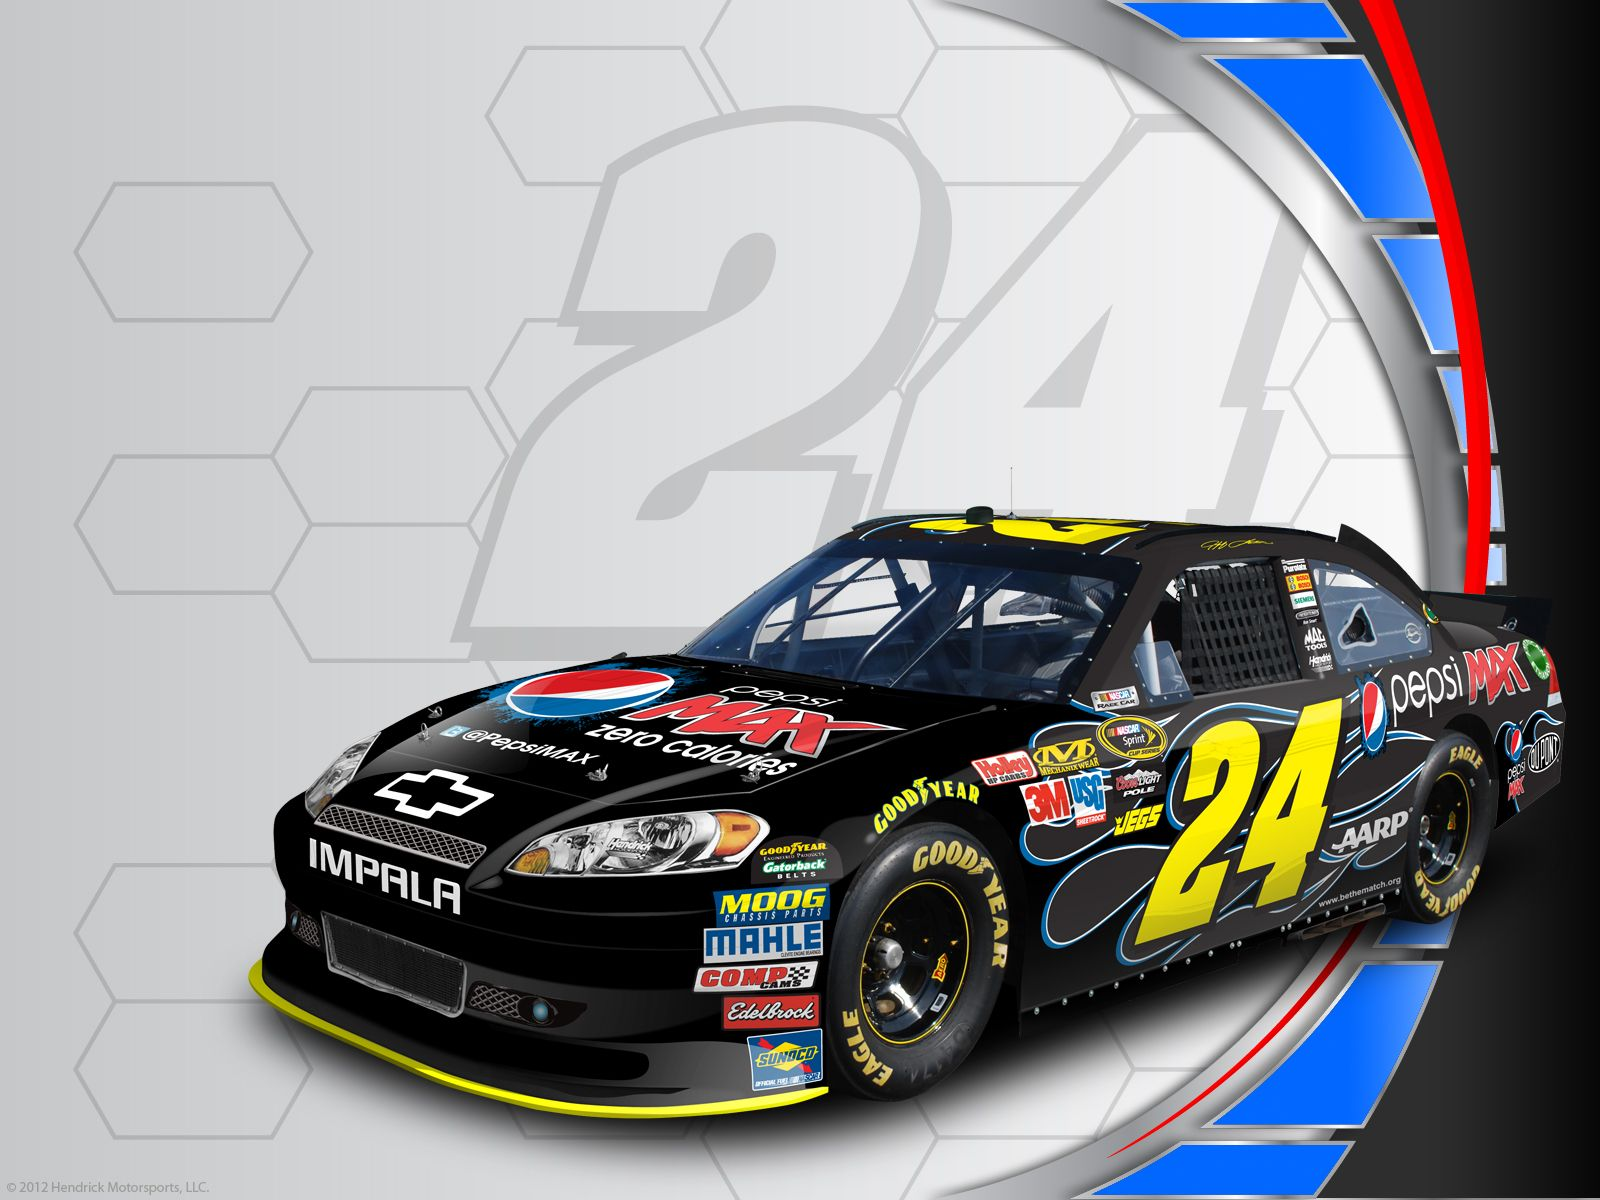 Jeff Gordon's No. 24 PepsiMAX Chevrolet desktop wallpaper